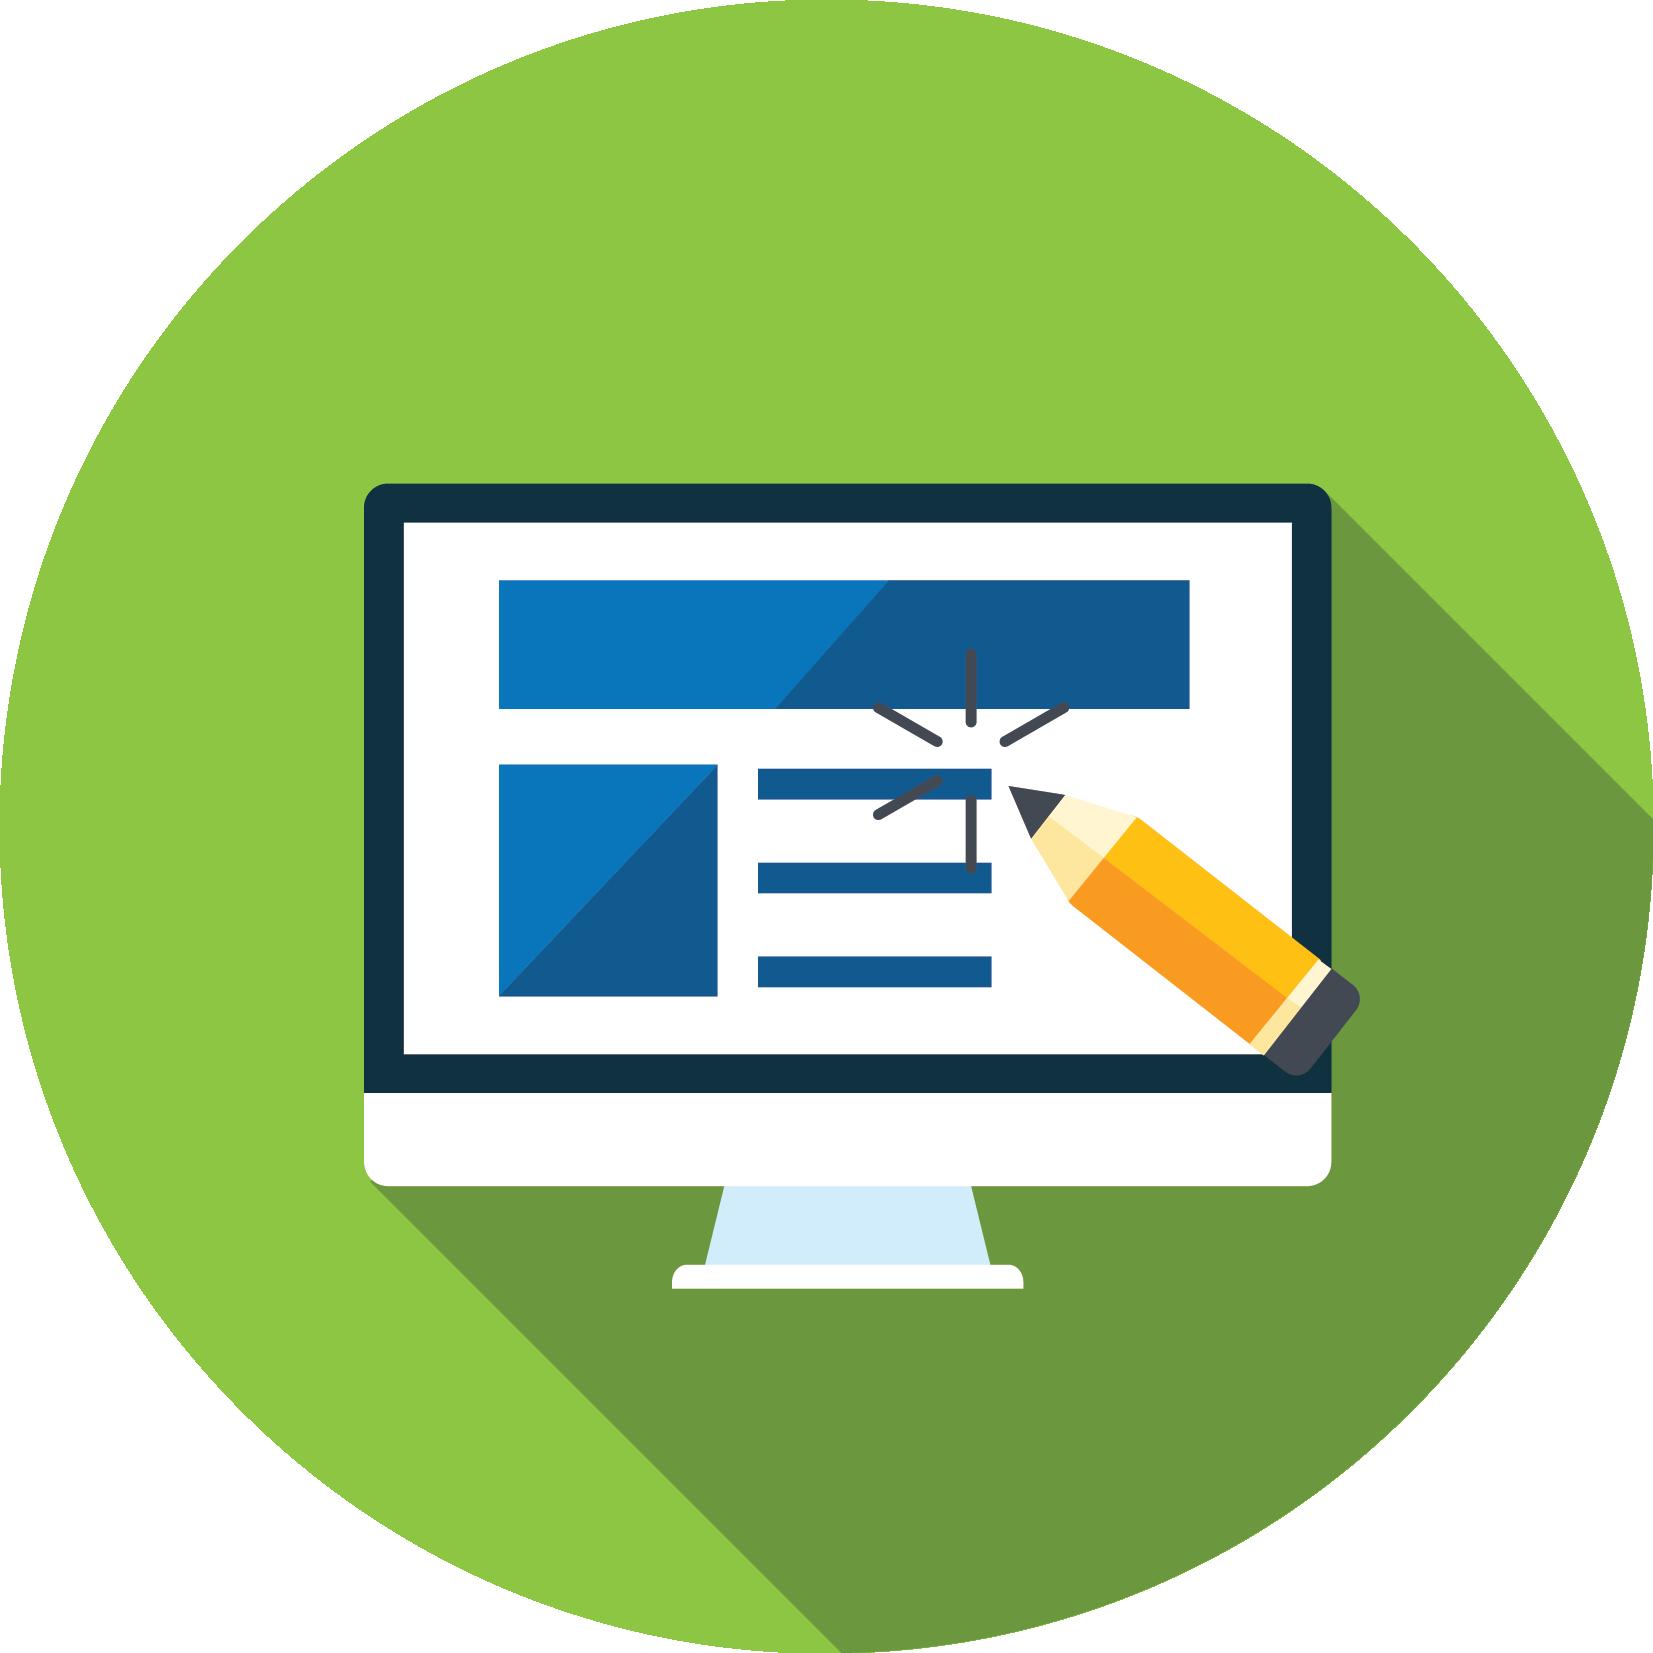 Website clipart web service. Design application development services